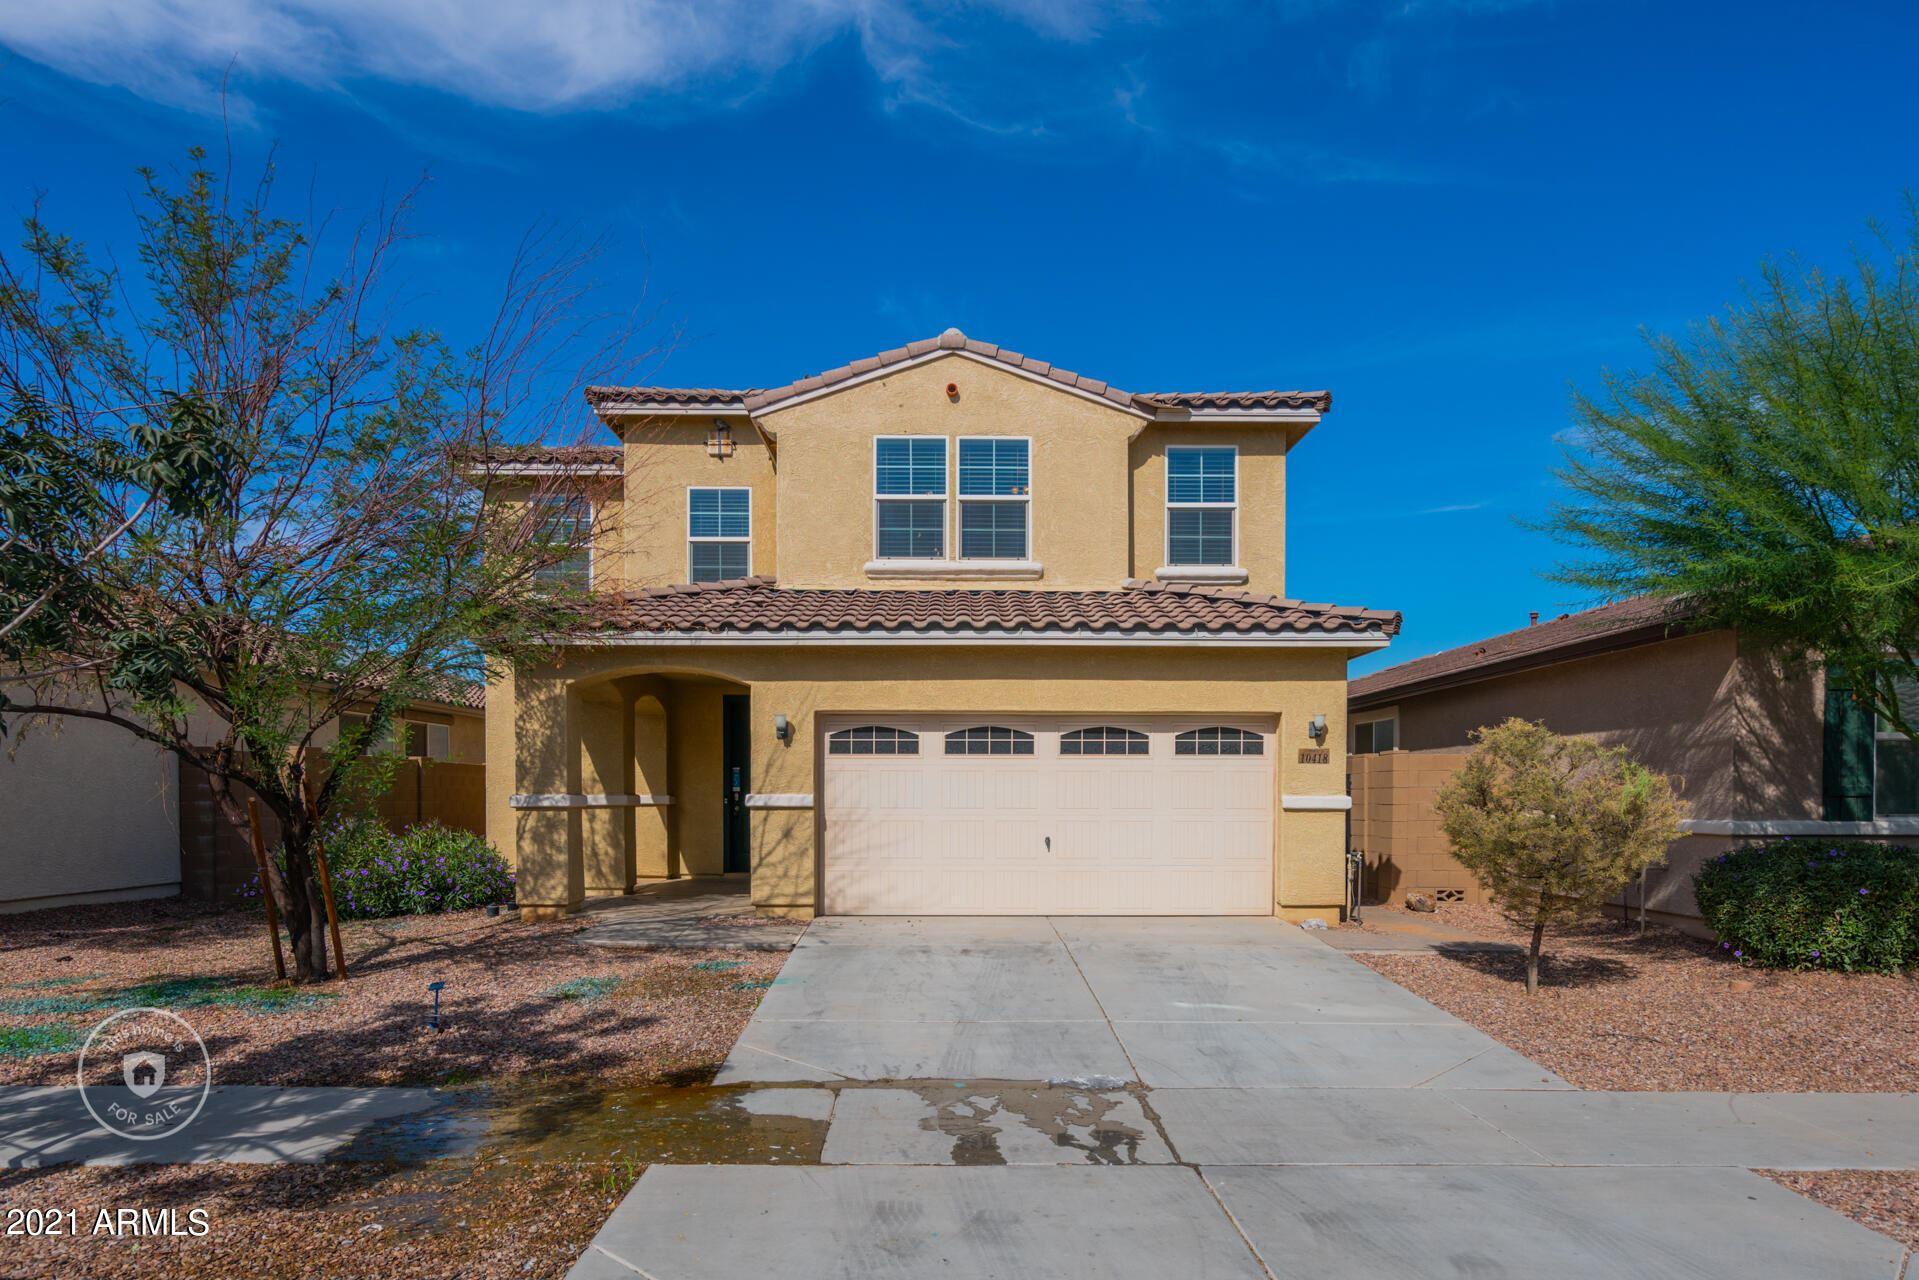 Photo of 10418 W PIMA Street, Tolleson, AZ 85353 (MLS # 6311186)